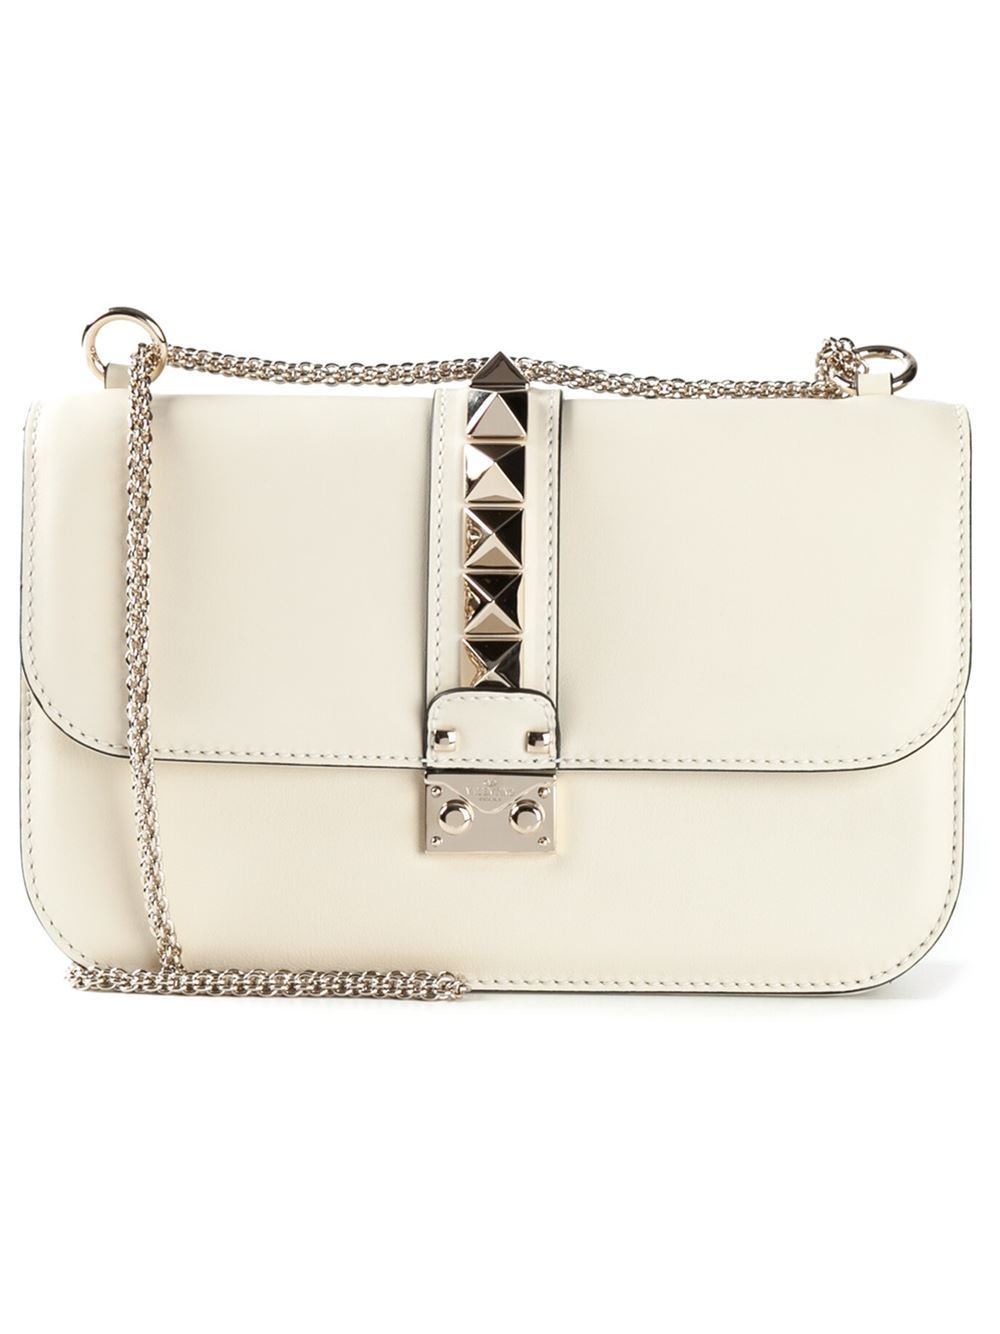 c0417f4da4 Valentino Glam Lock Leather Shoulder Bag in White - Lyst